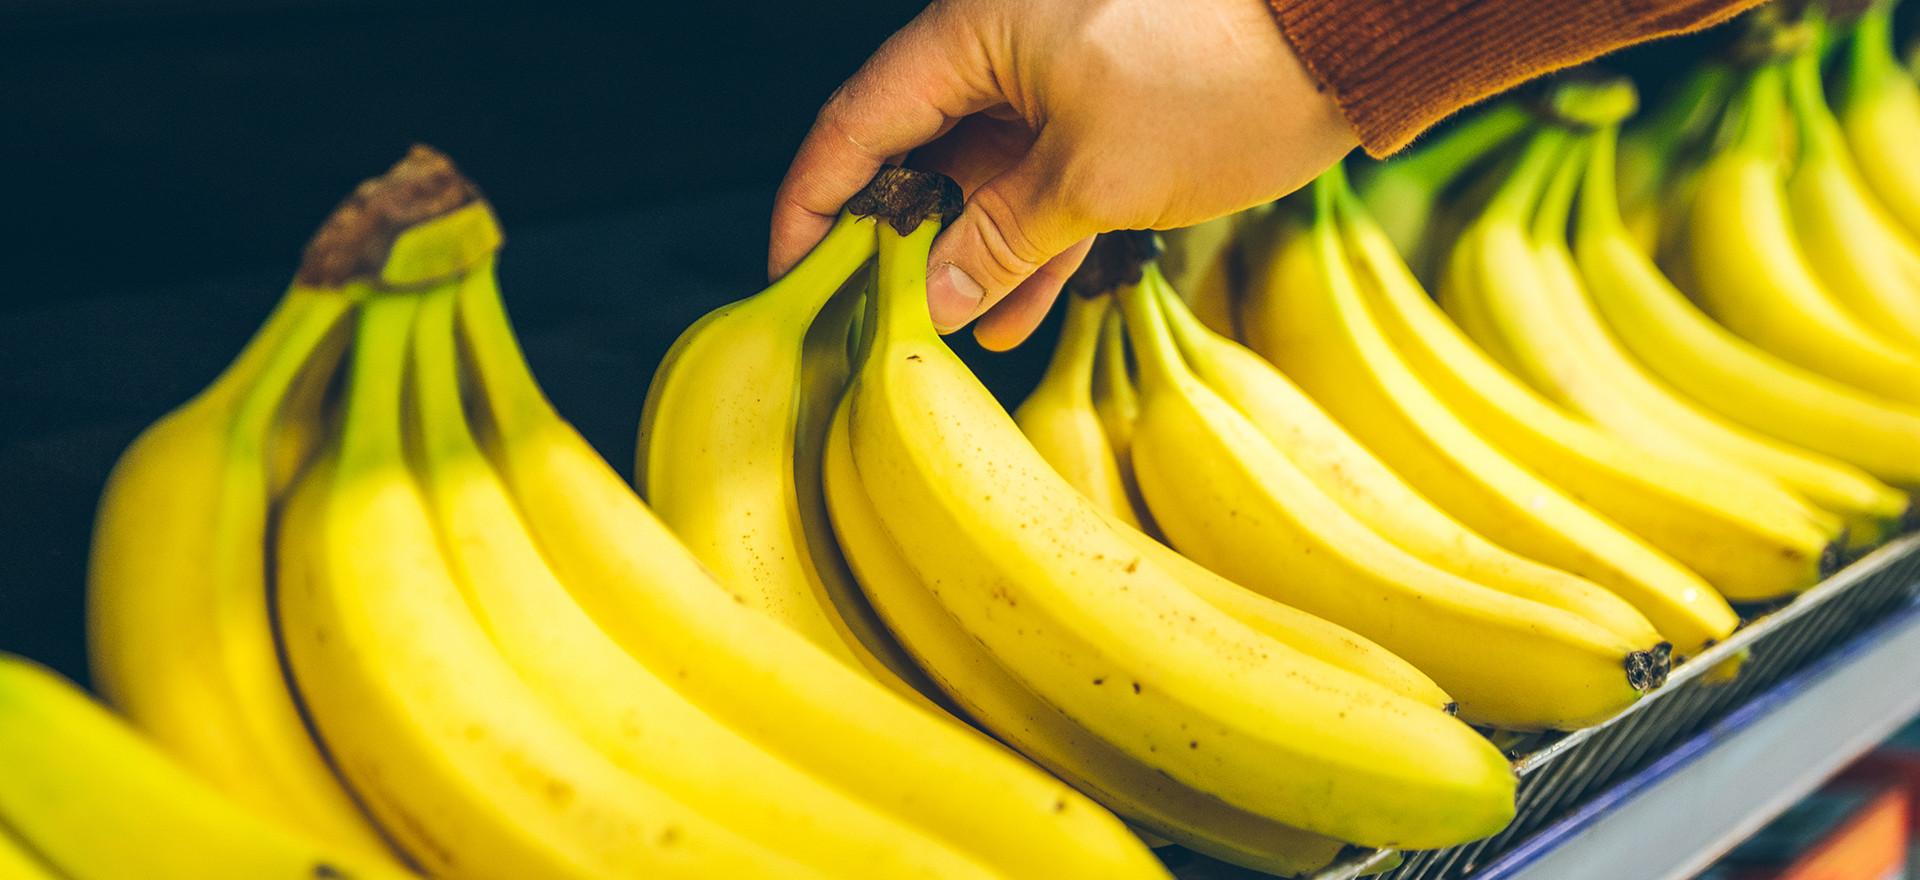 bananas-1920-4.jpg